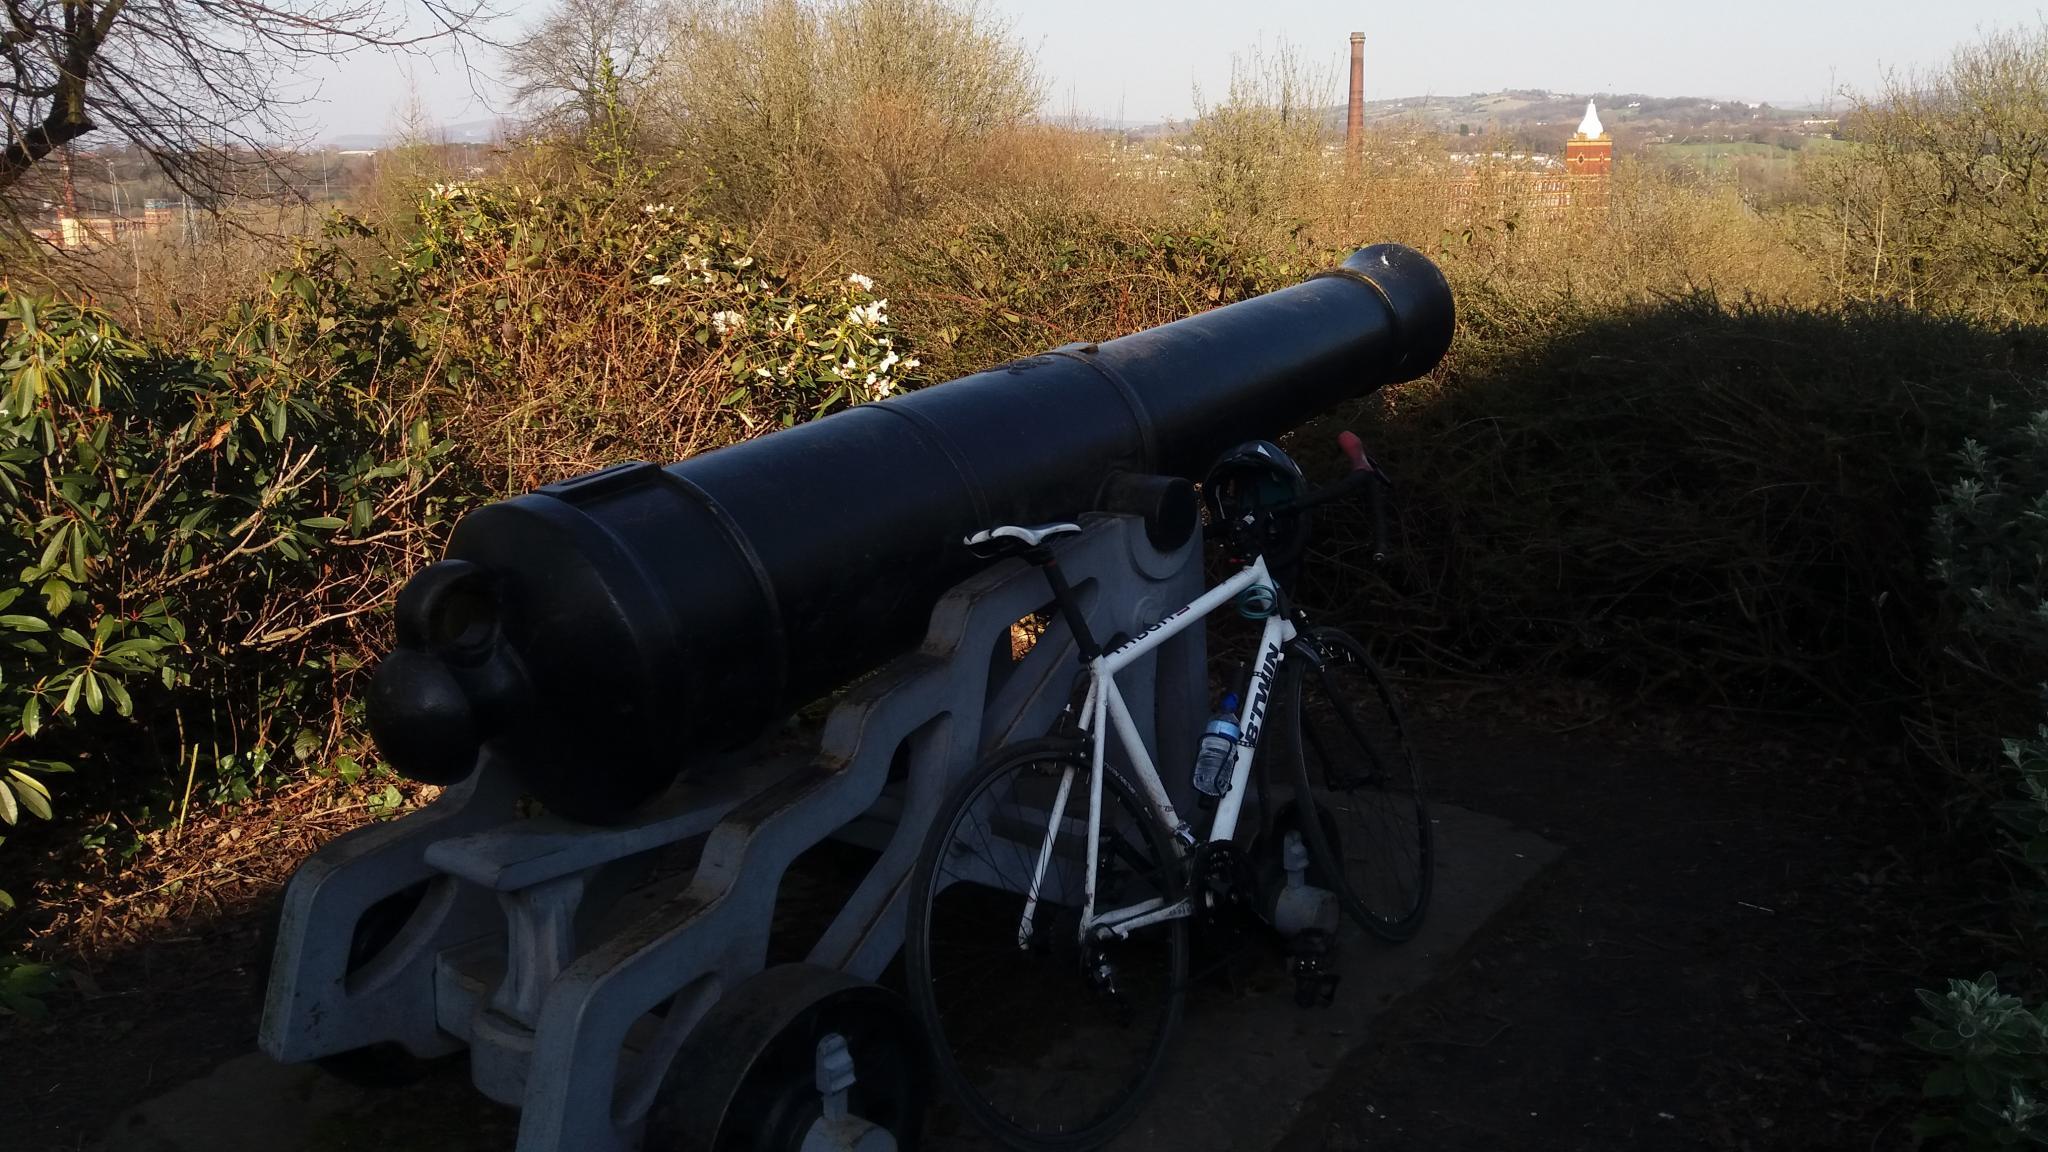 On my bike-20200325_154944-jpg